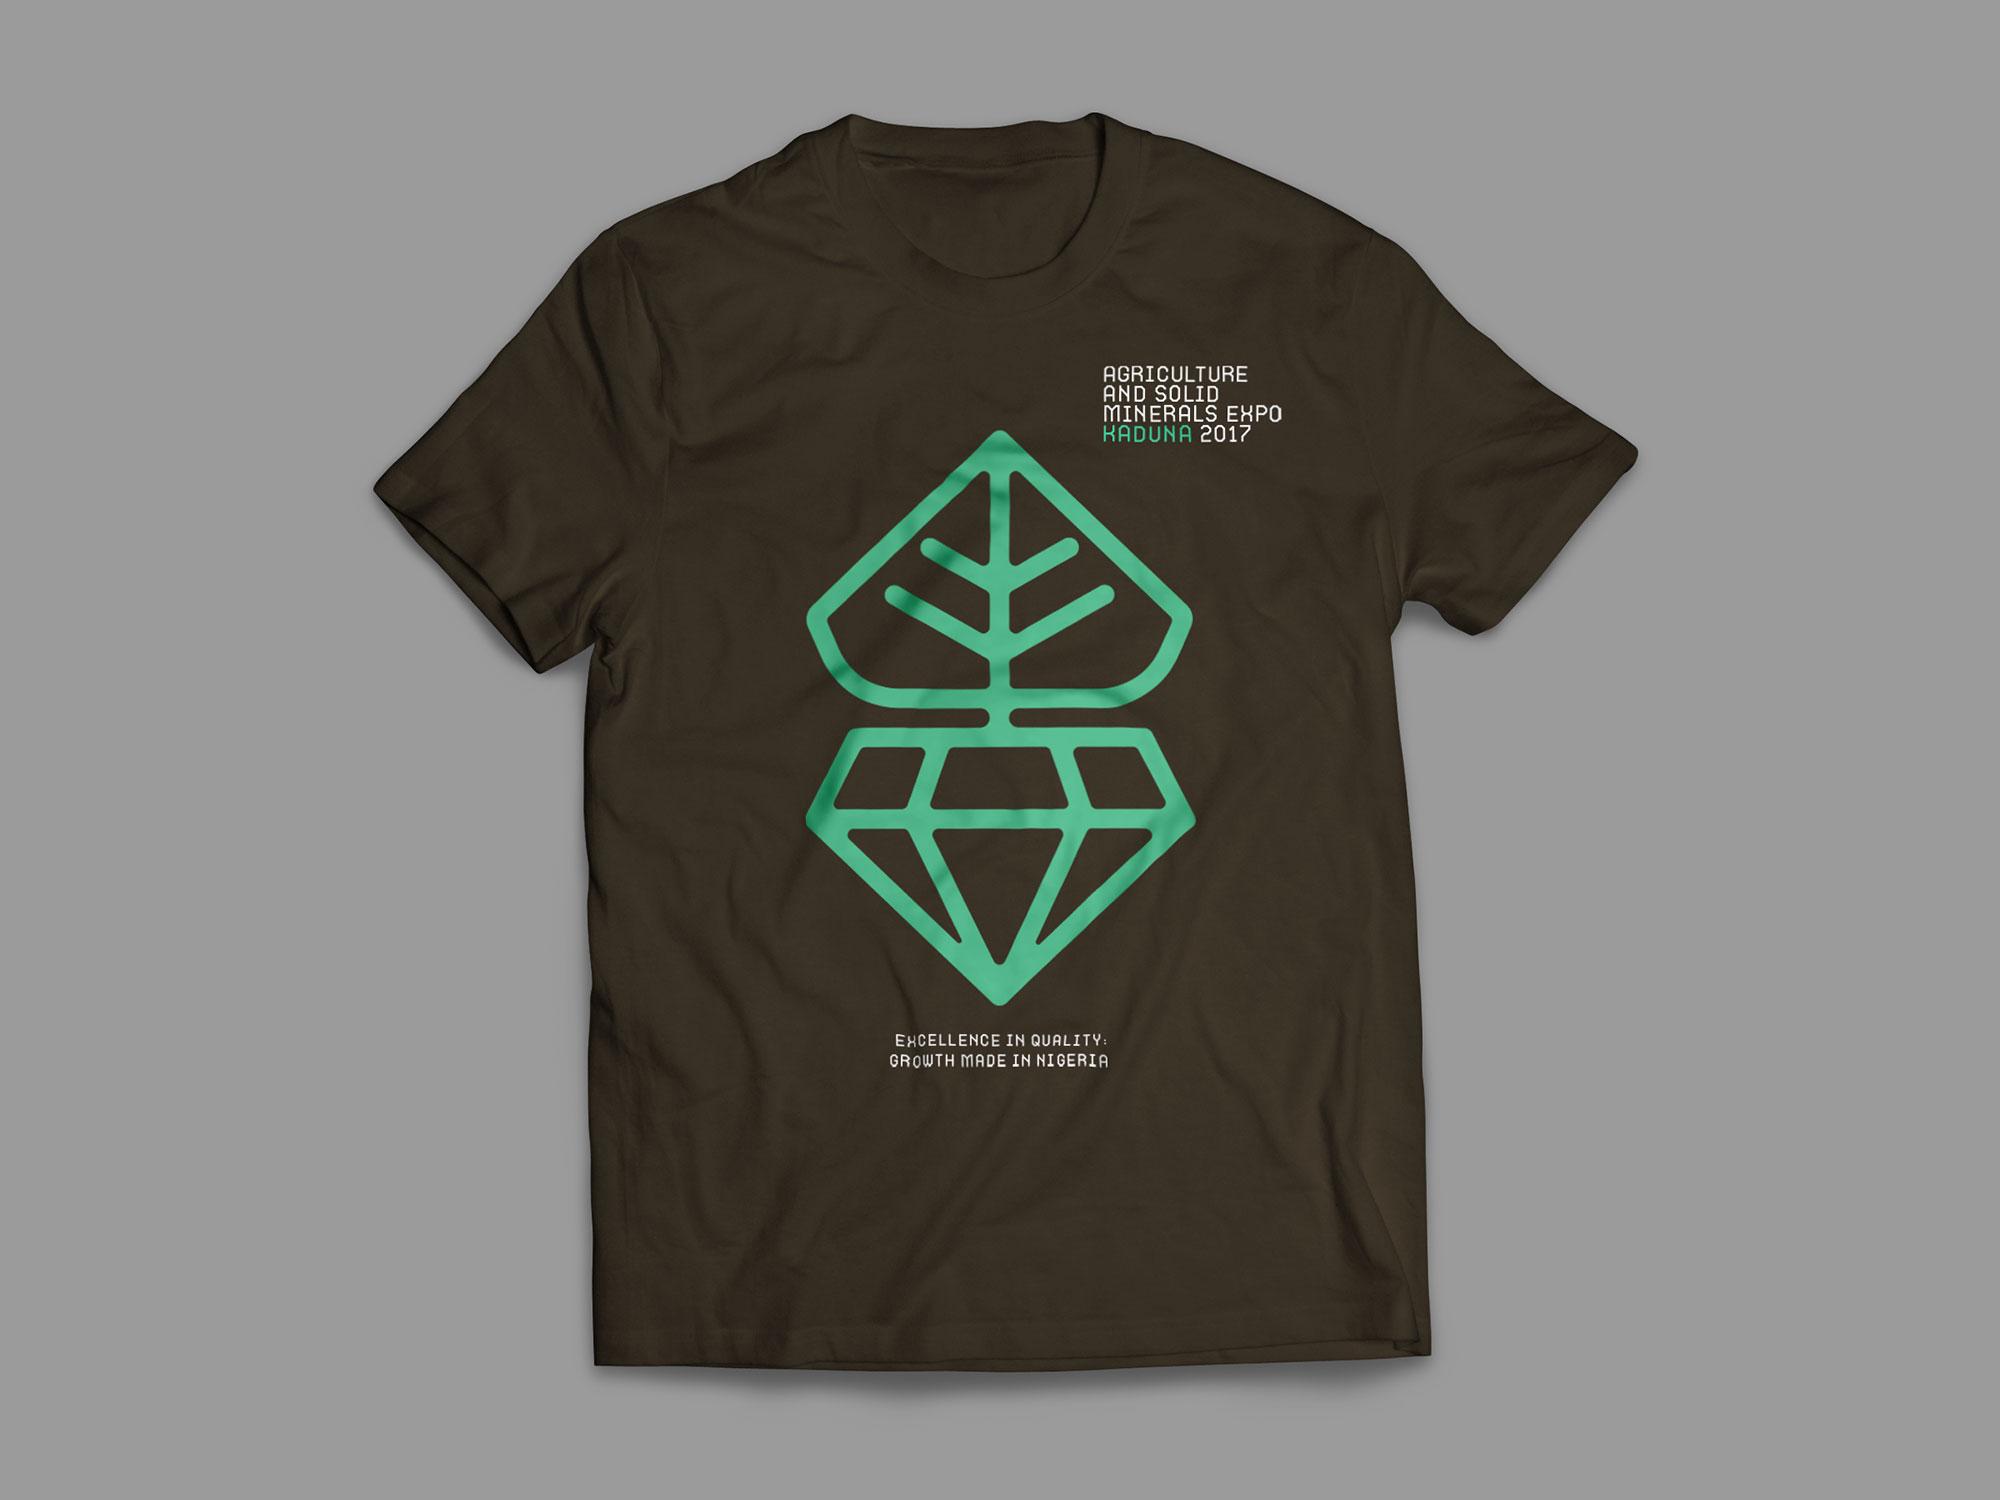 kaduna-shirt-2